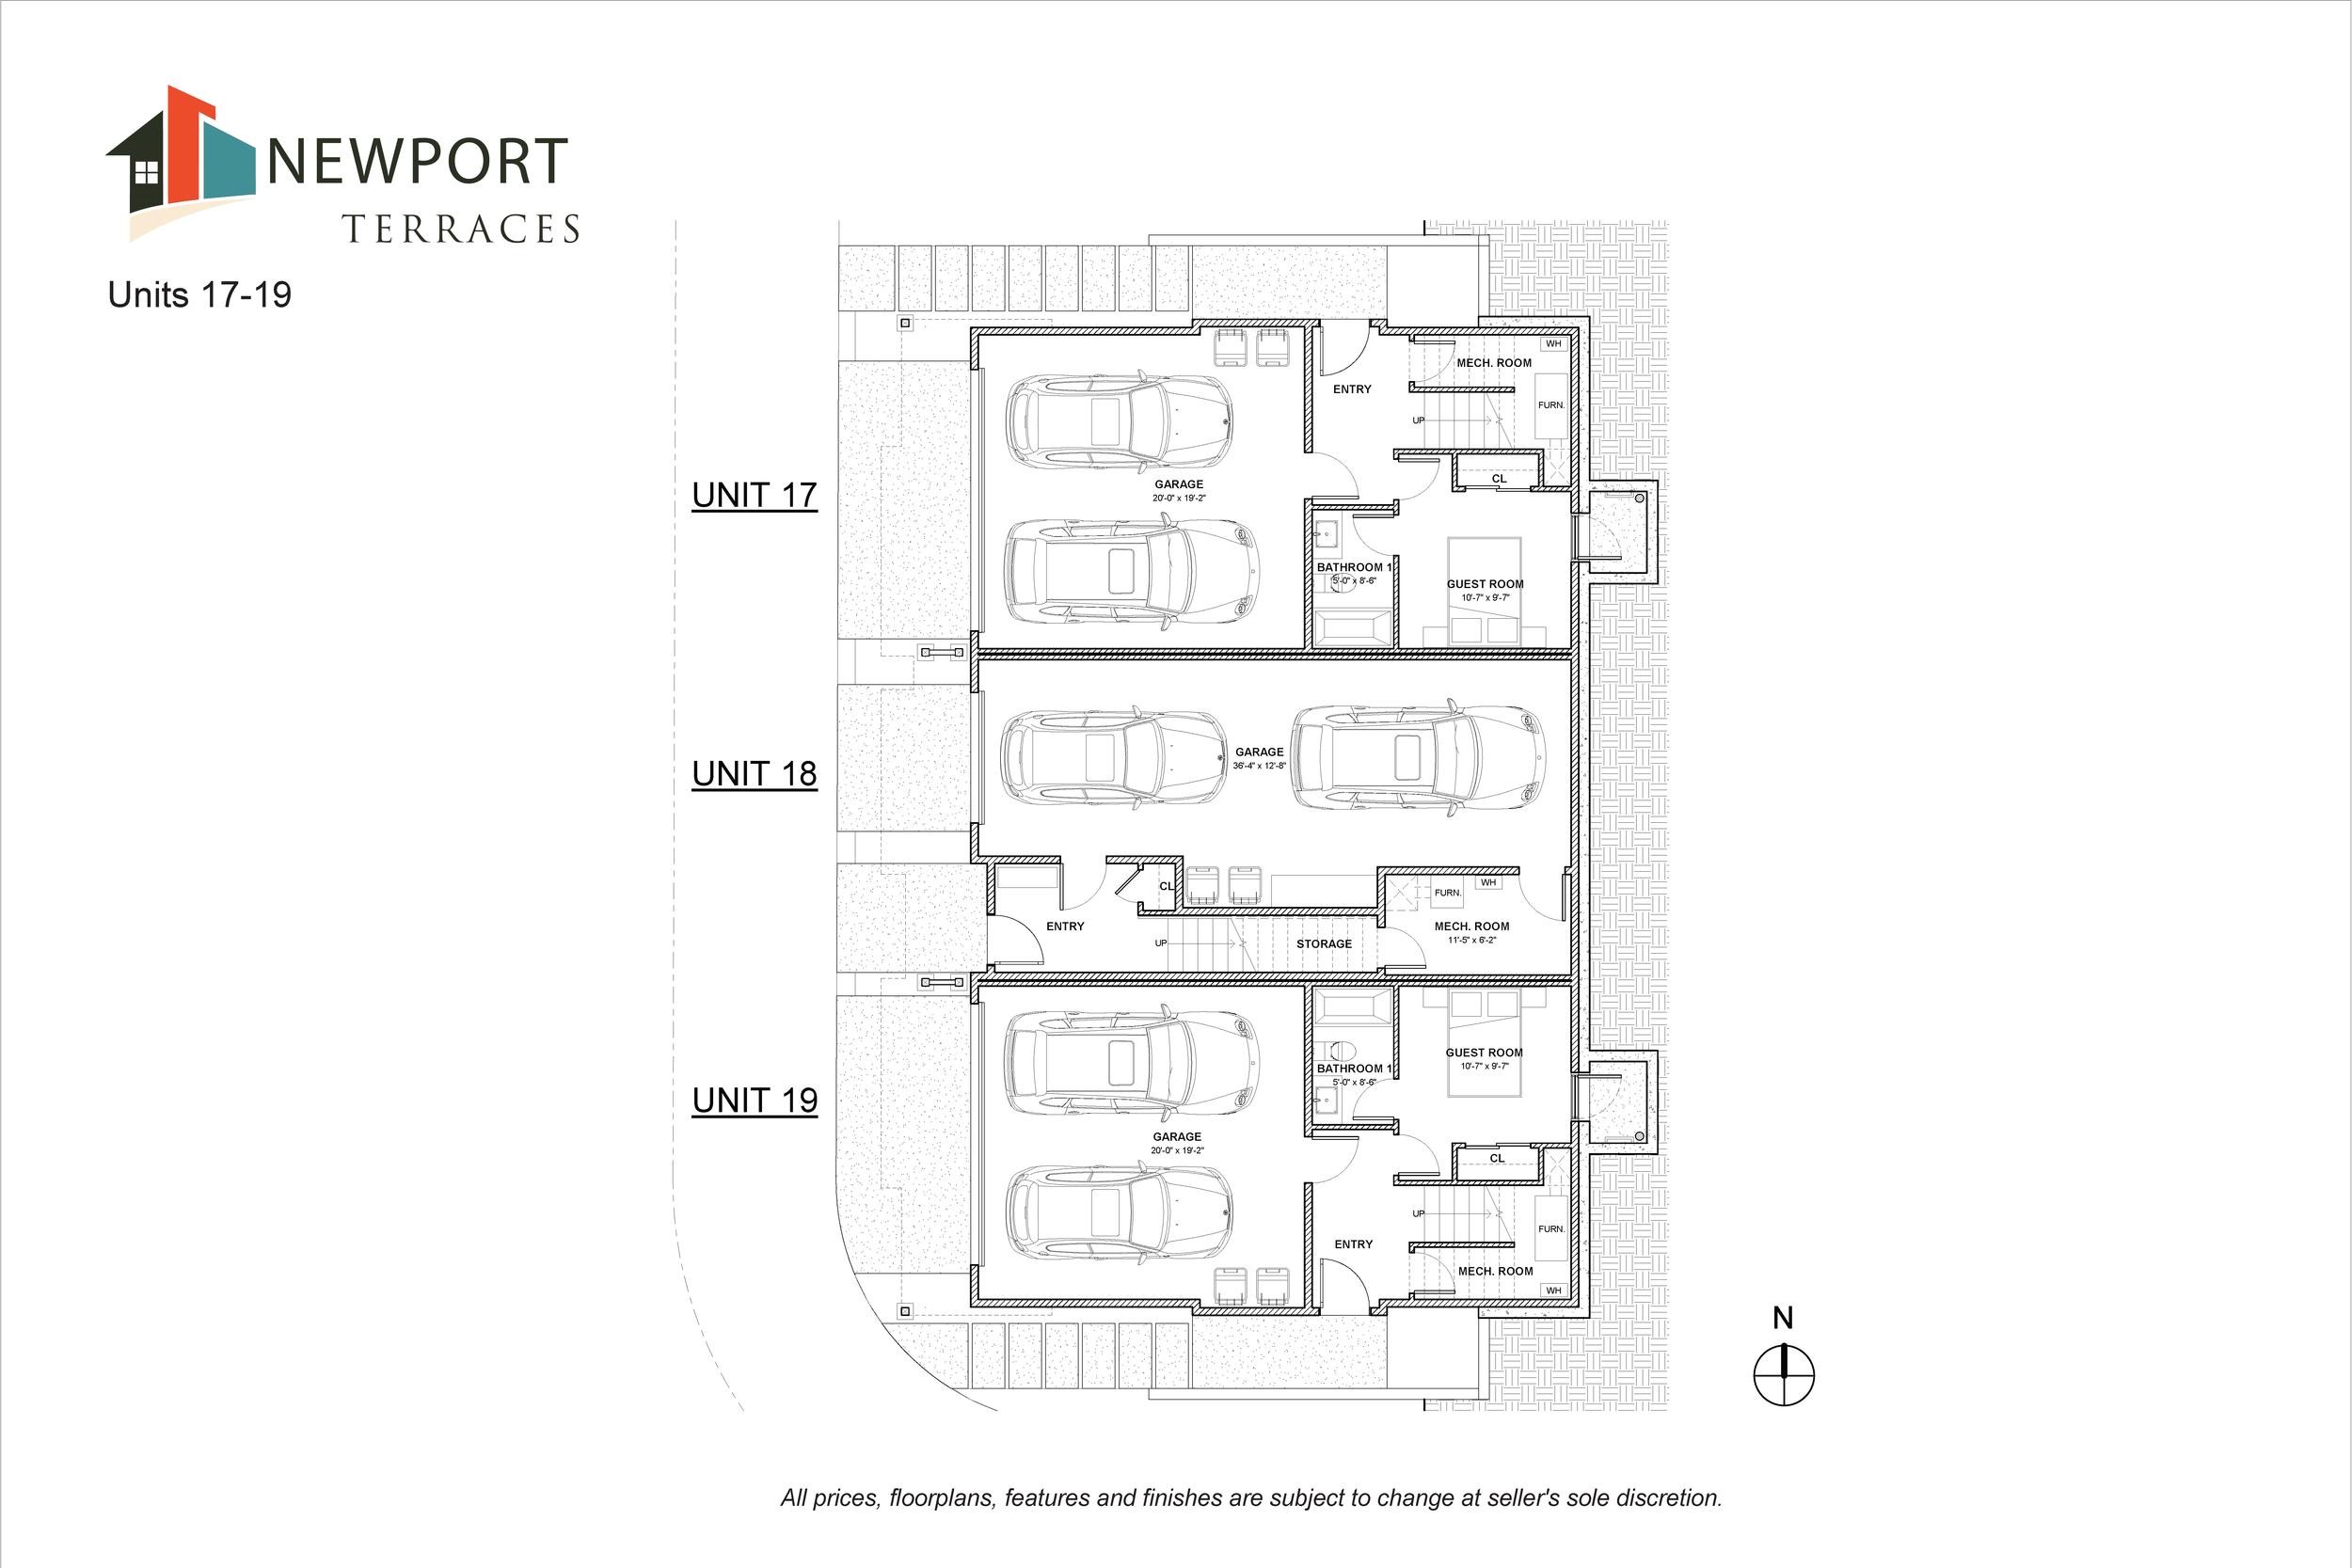 Newport Floorplans L17 L18 L19_Page_1.png